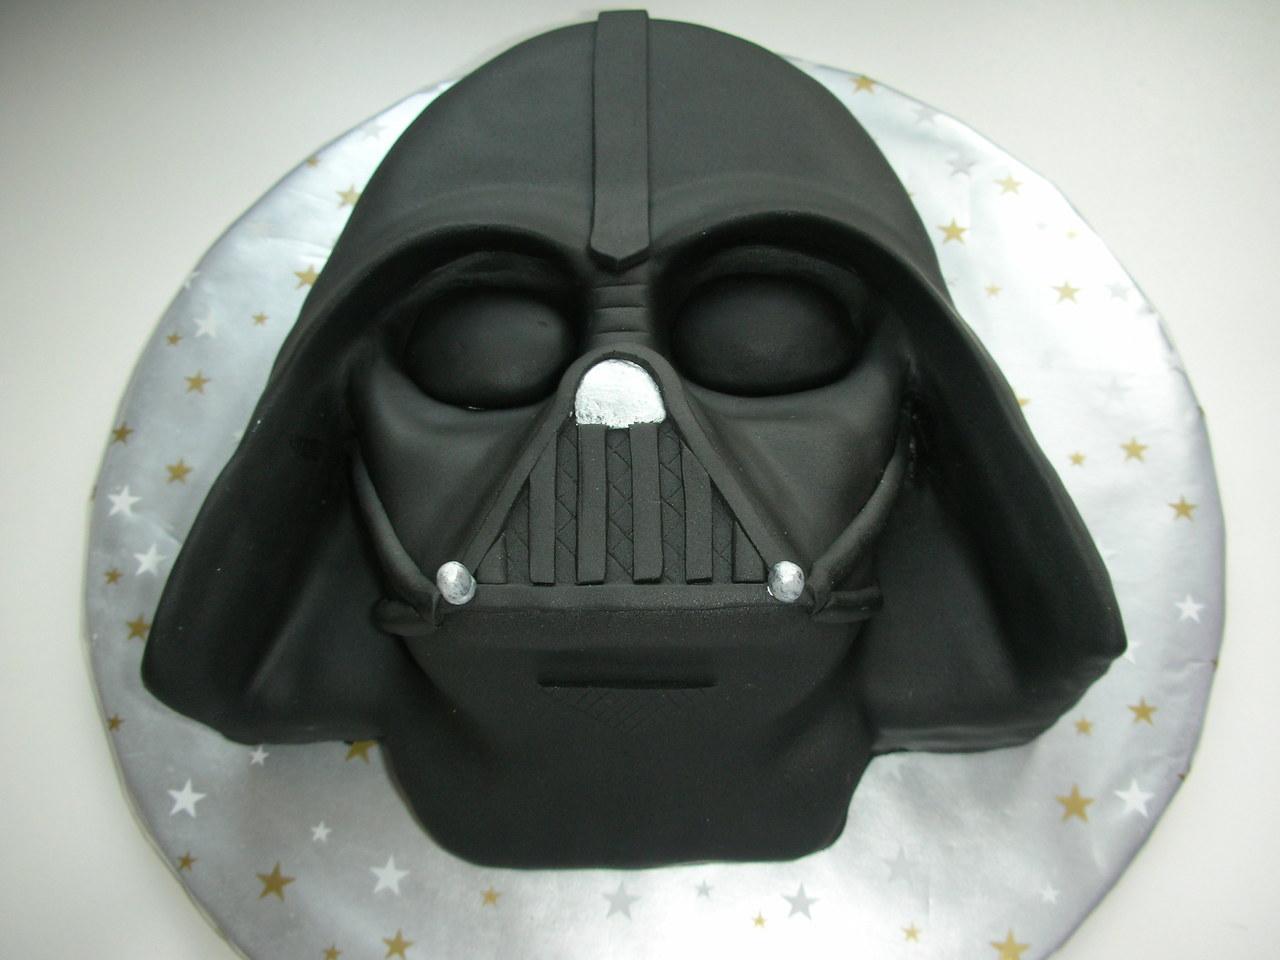 Darth Vader Cake By I Black Fashion Whi